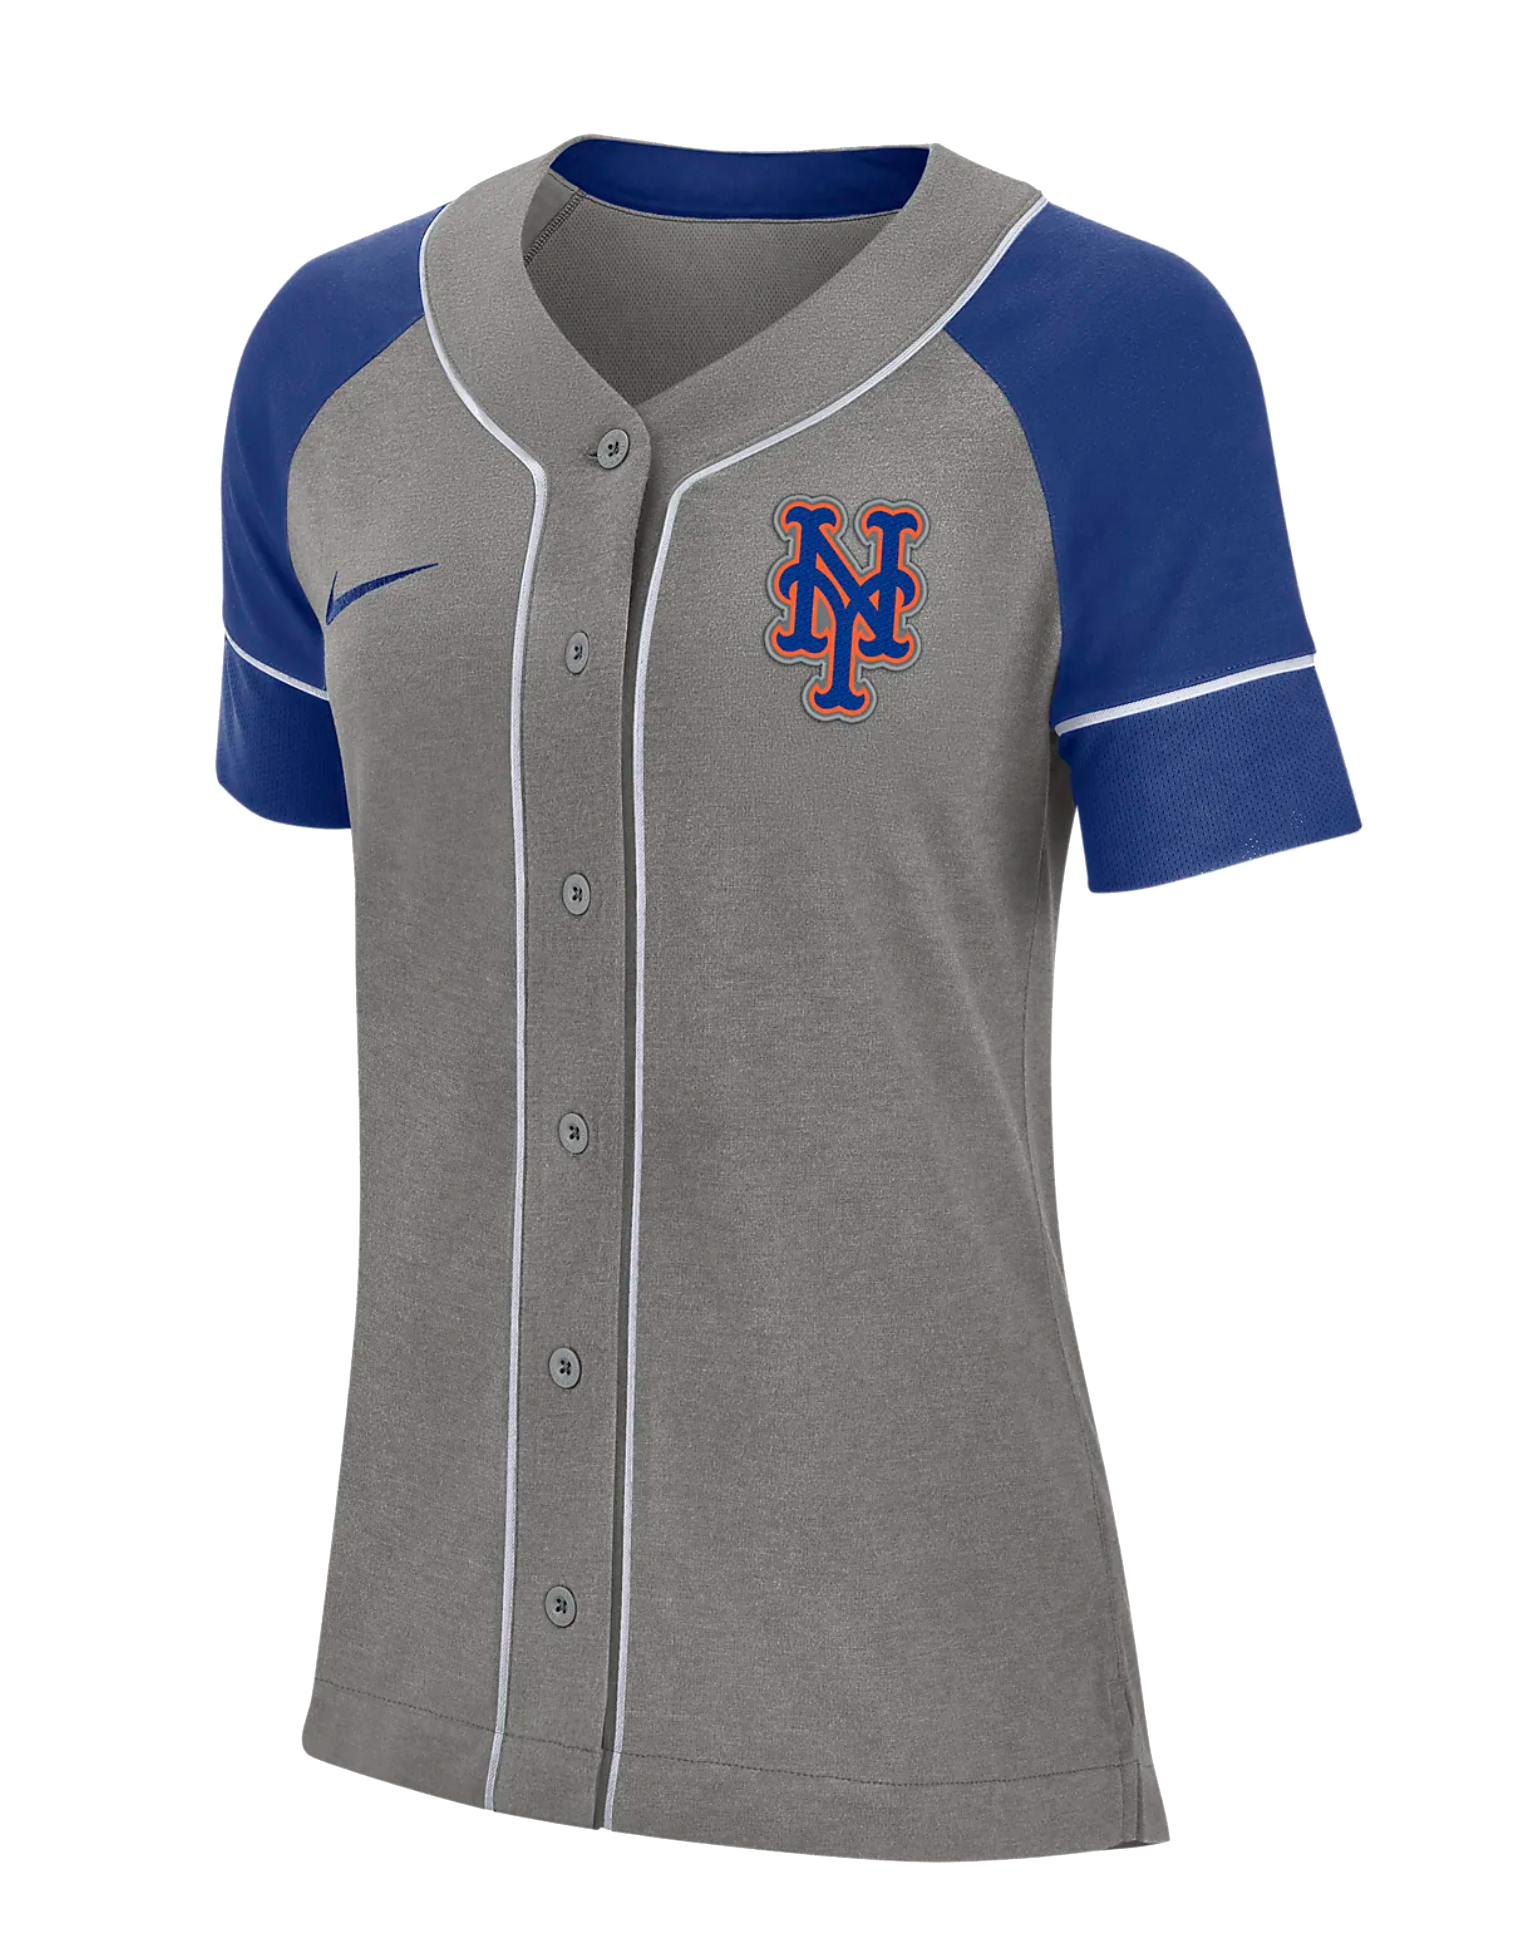 Nike Dri-FIT (MLB Mets)-Women's Baseball Jersey